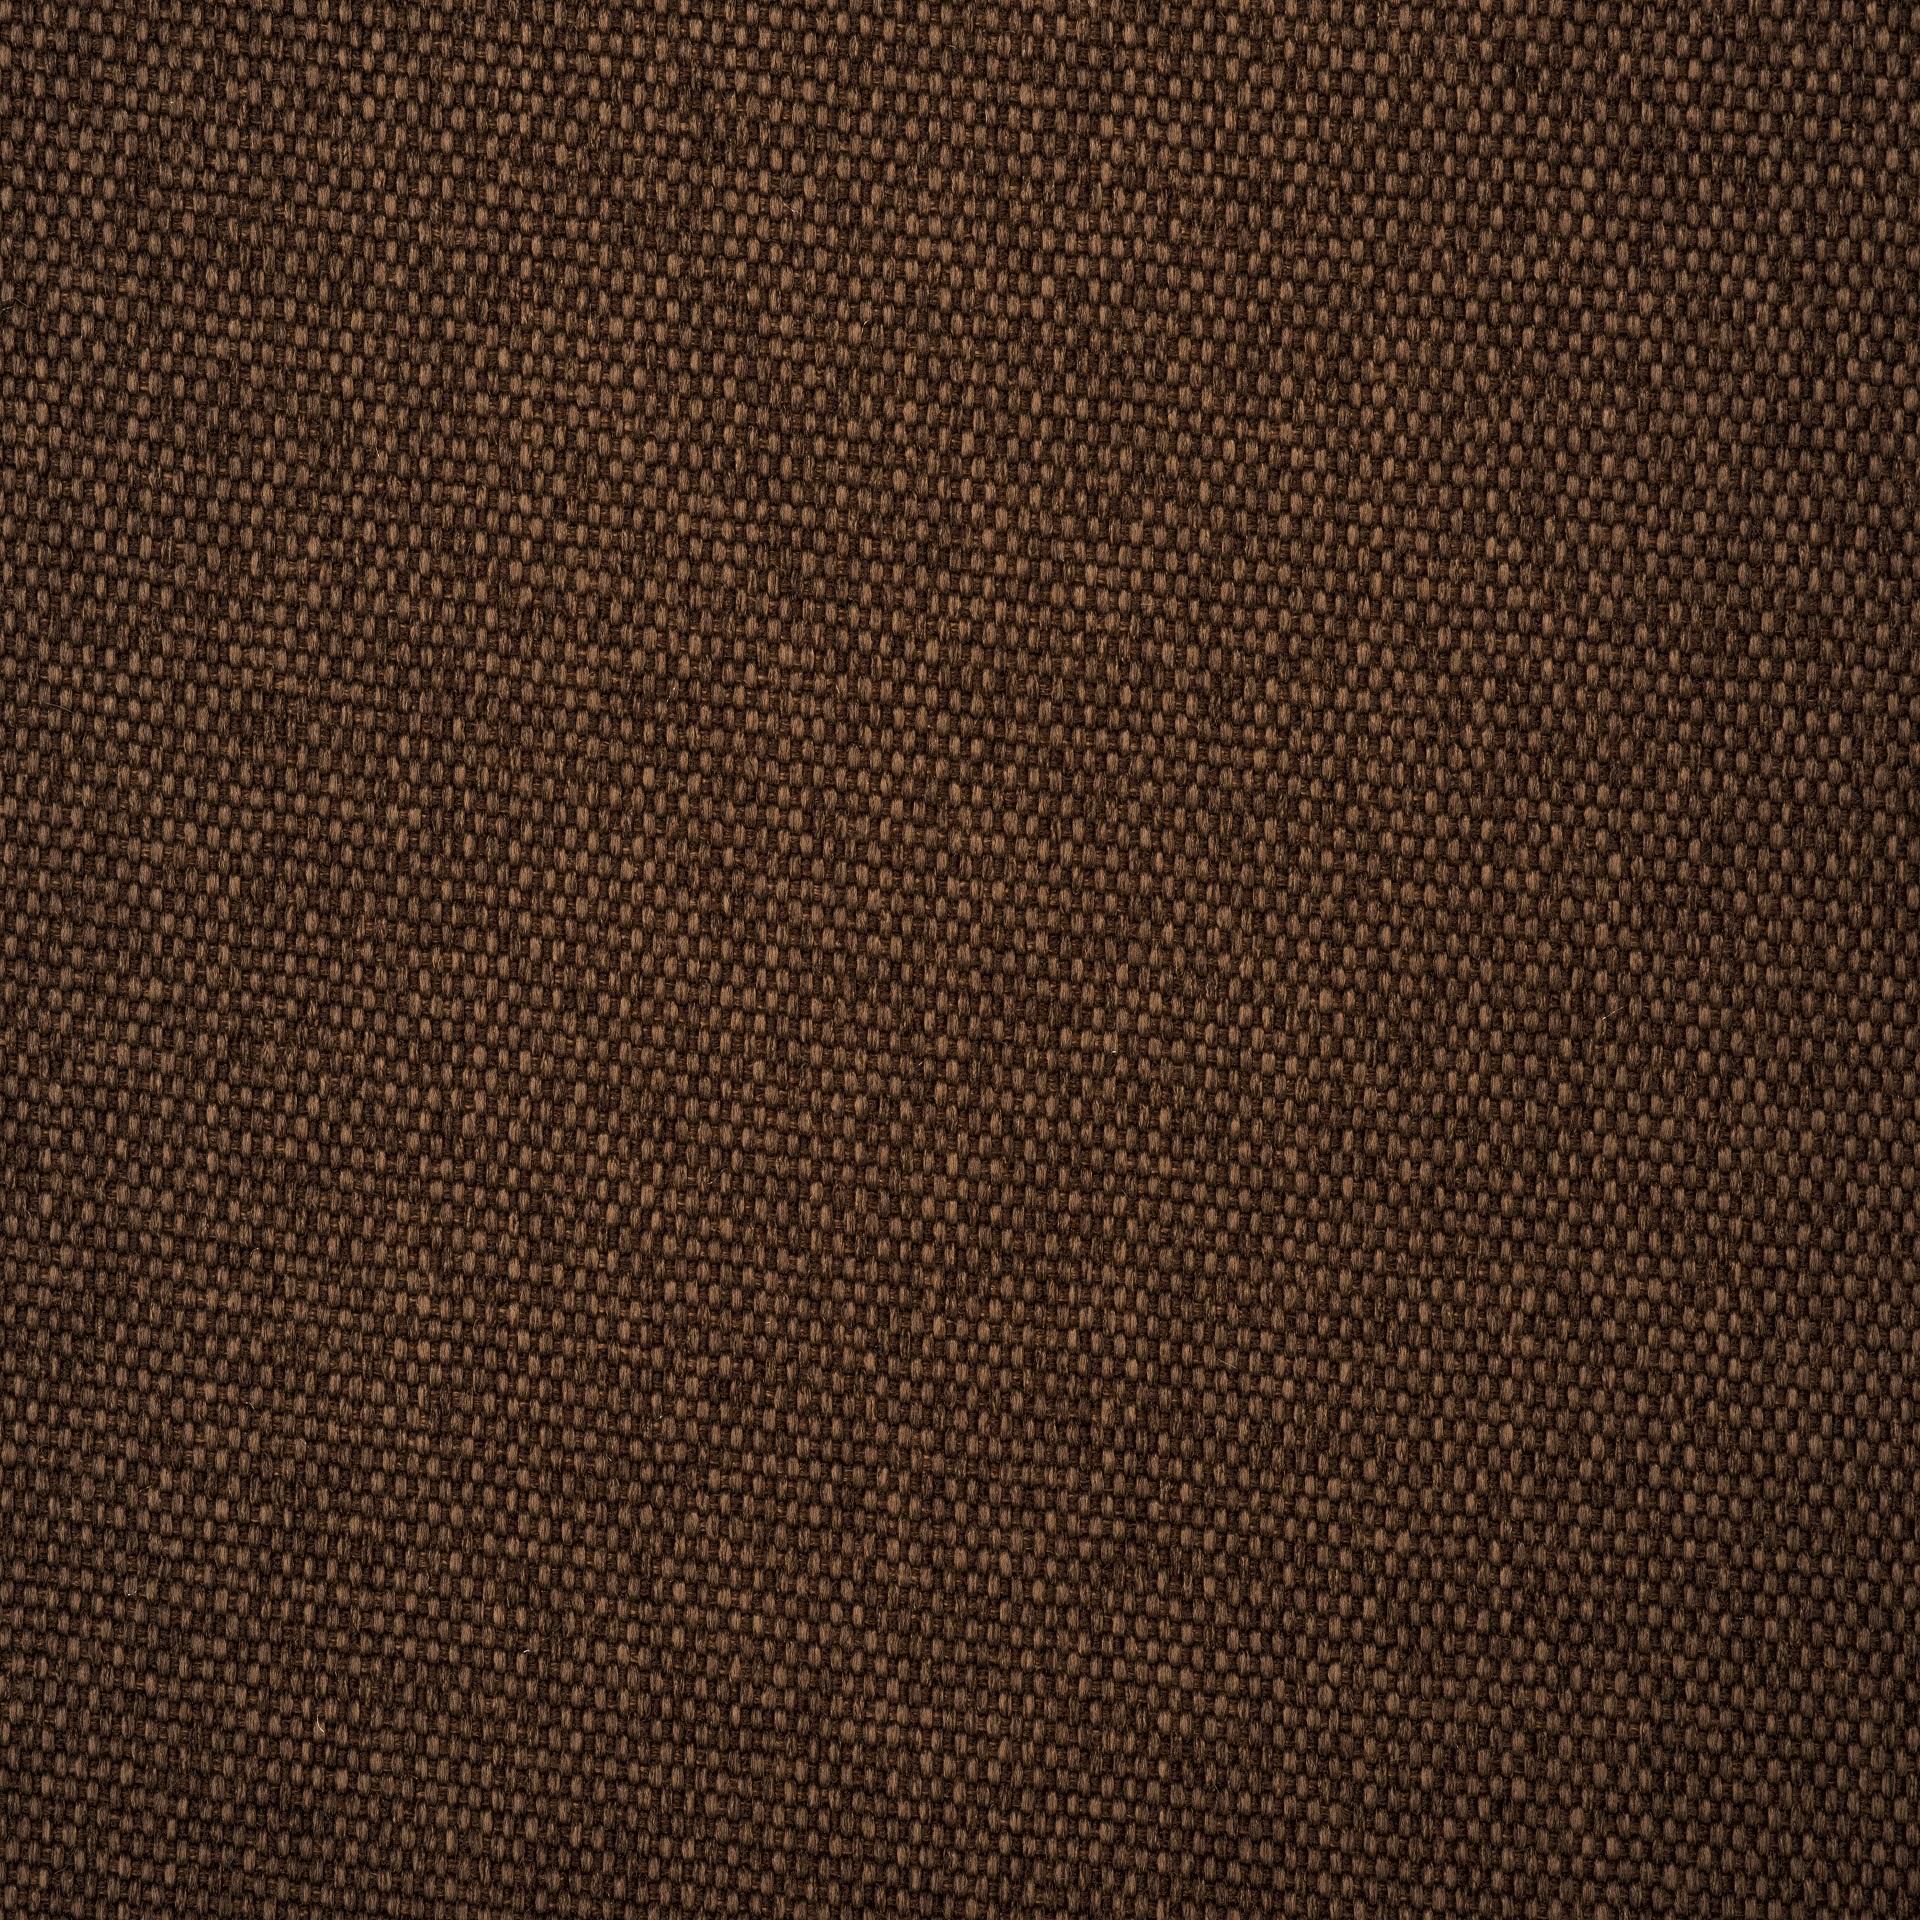 Коллекция ткани Багама 08 Chocolate,  купить ткань Жаккард для мебели Украина